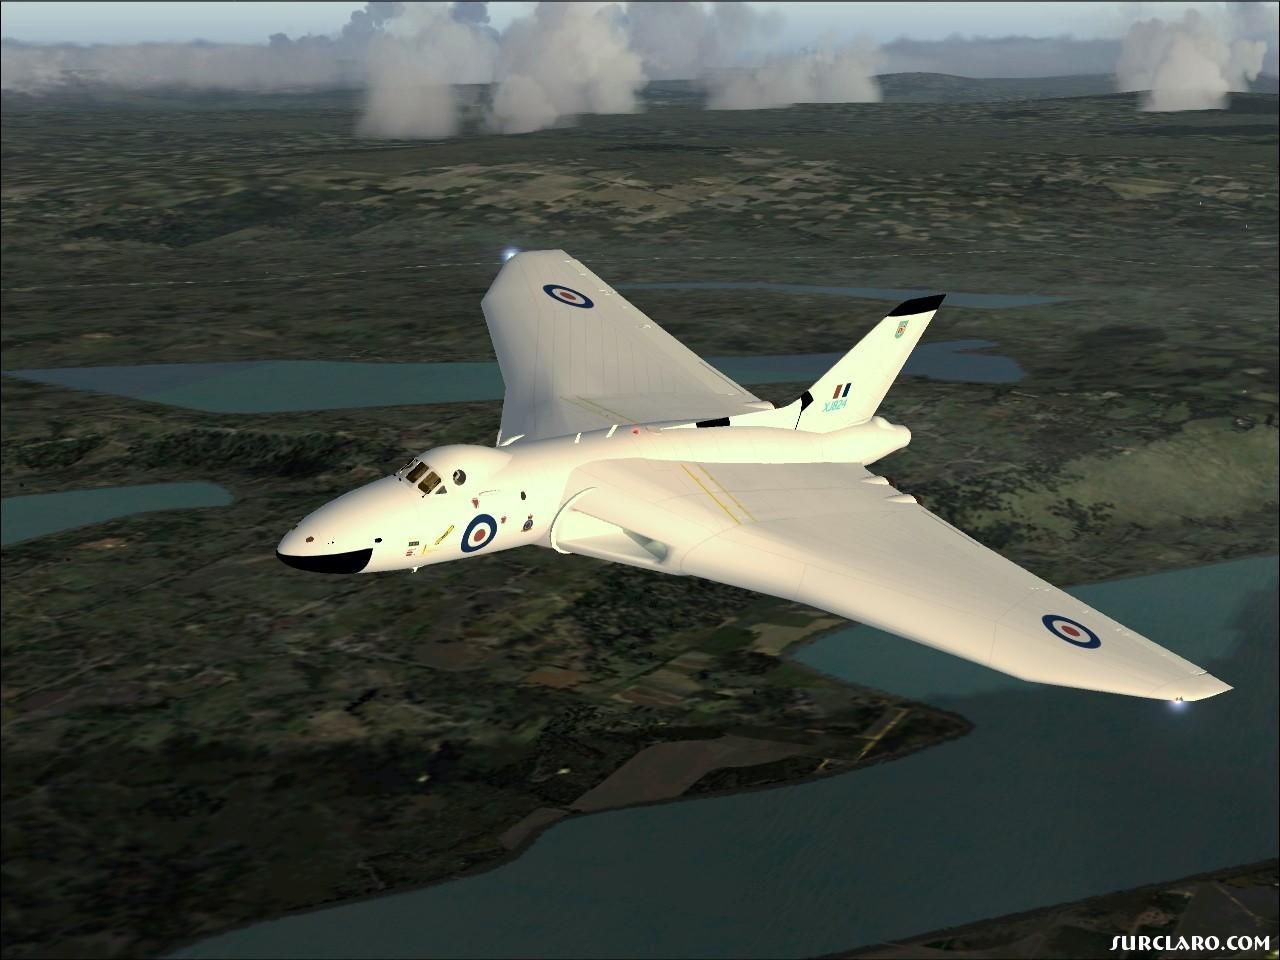 http://itdoesnthavetoberight.files.wordpress.com/2013/05/17_avro_vulcan_bomber.jpg